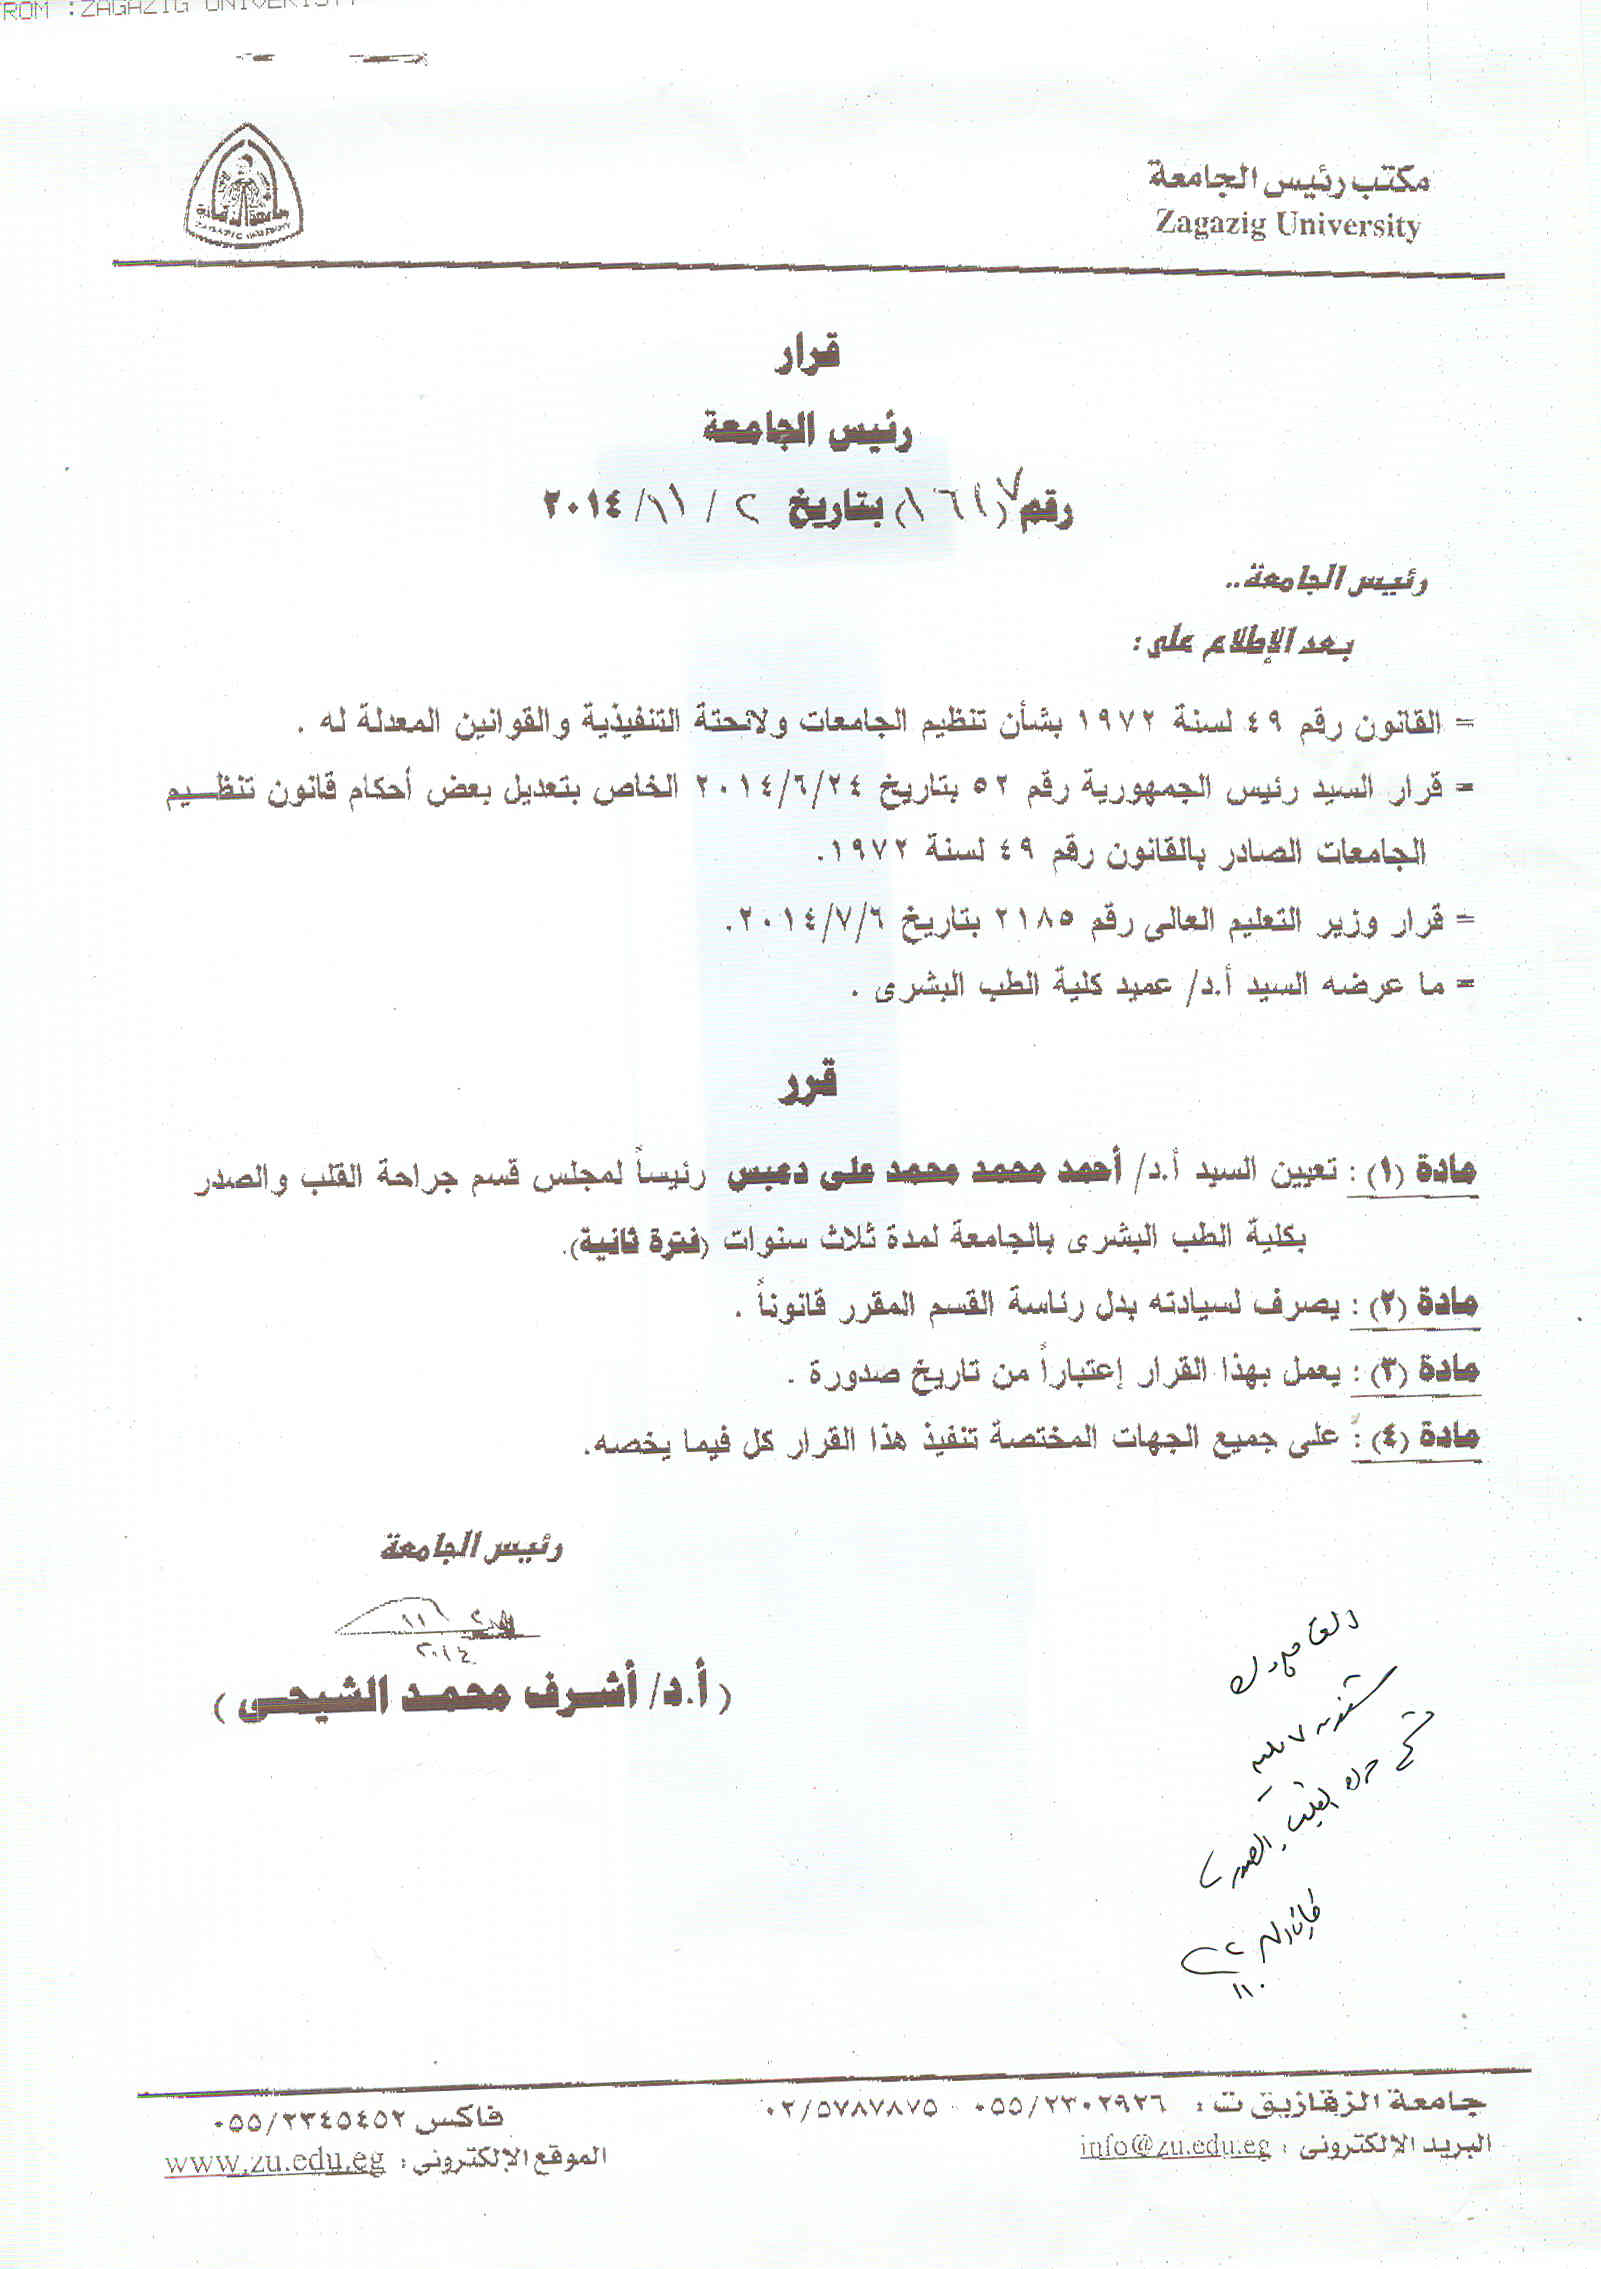 Ahmed Daabas head of cardiothoracic surgery